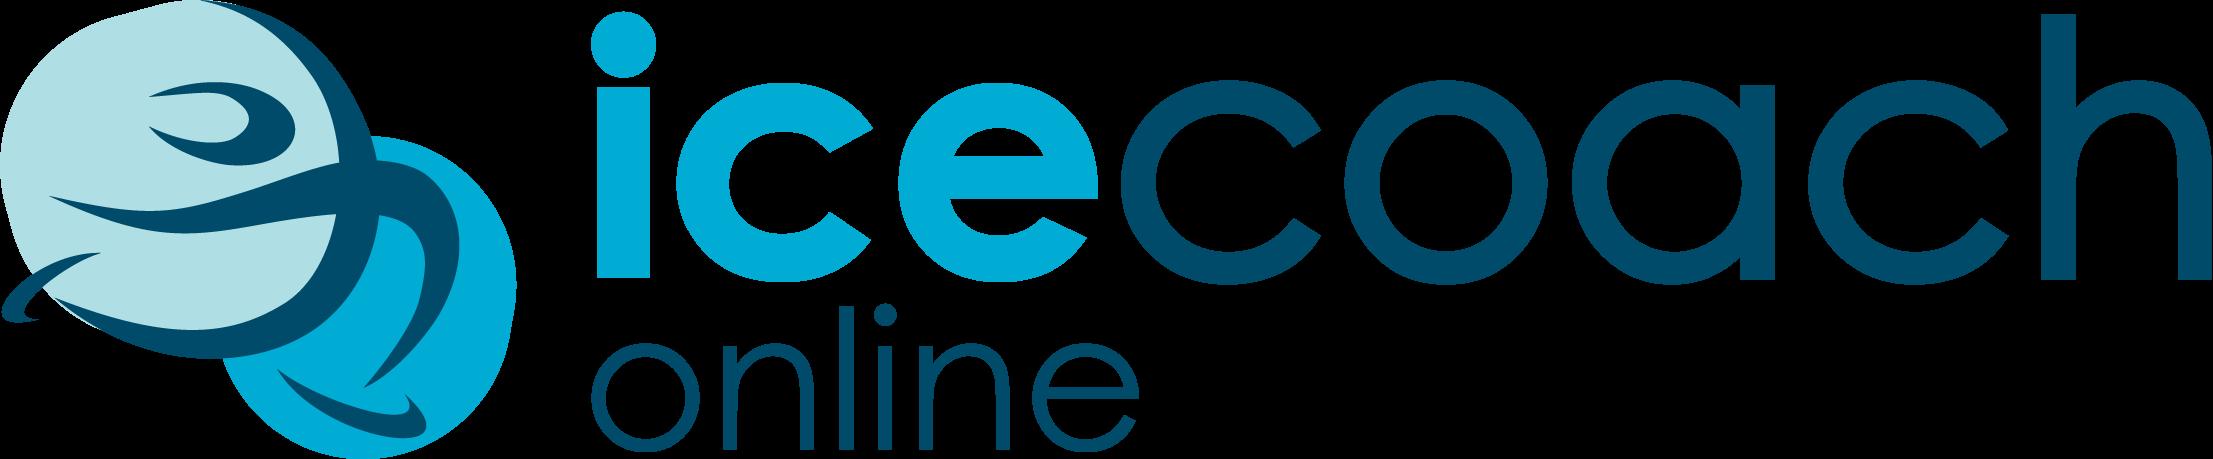 Ice Coach Online New